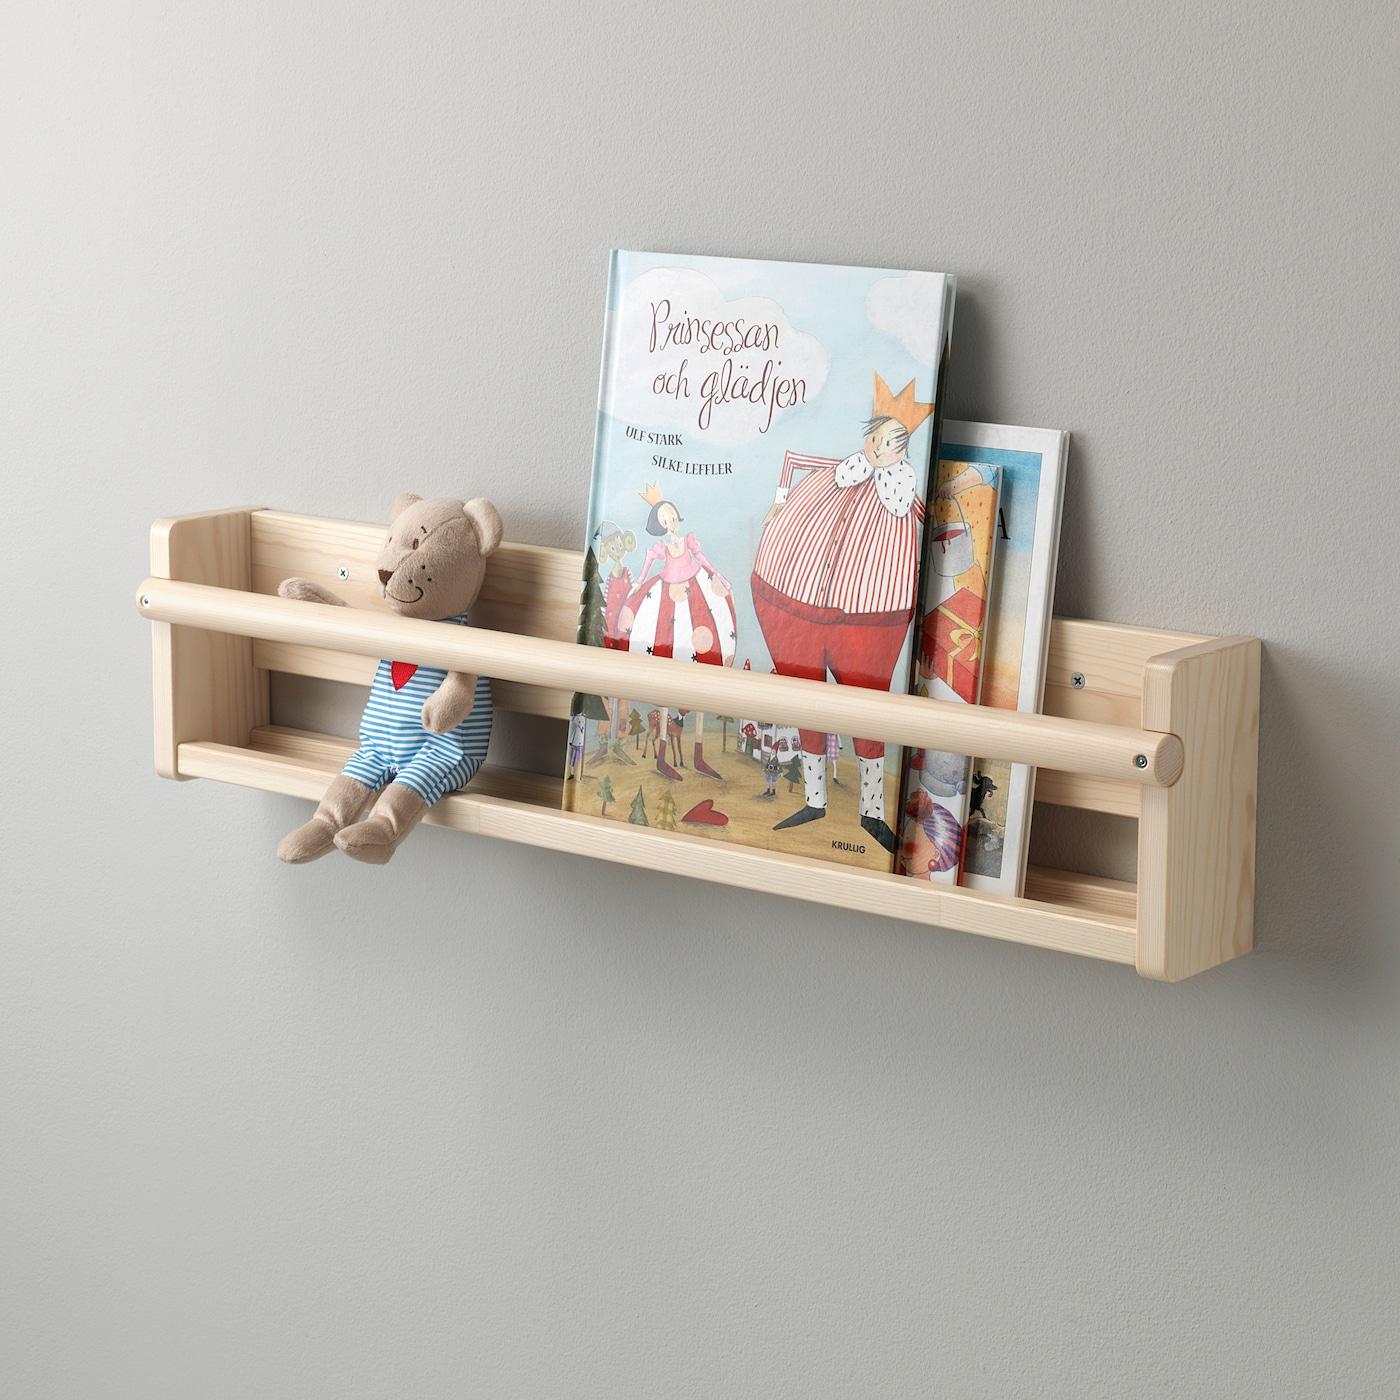 Image of: Flisat Wall Storage 27 X3 X6 Ikea